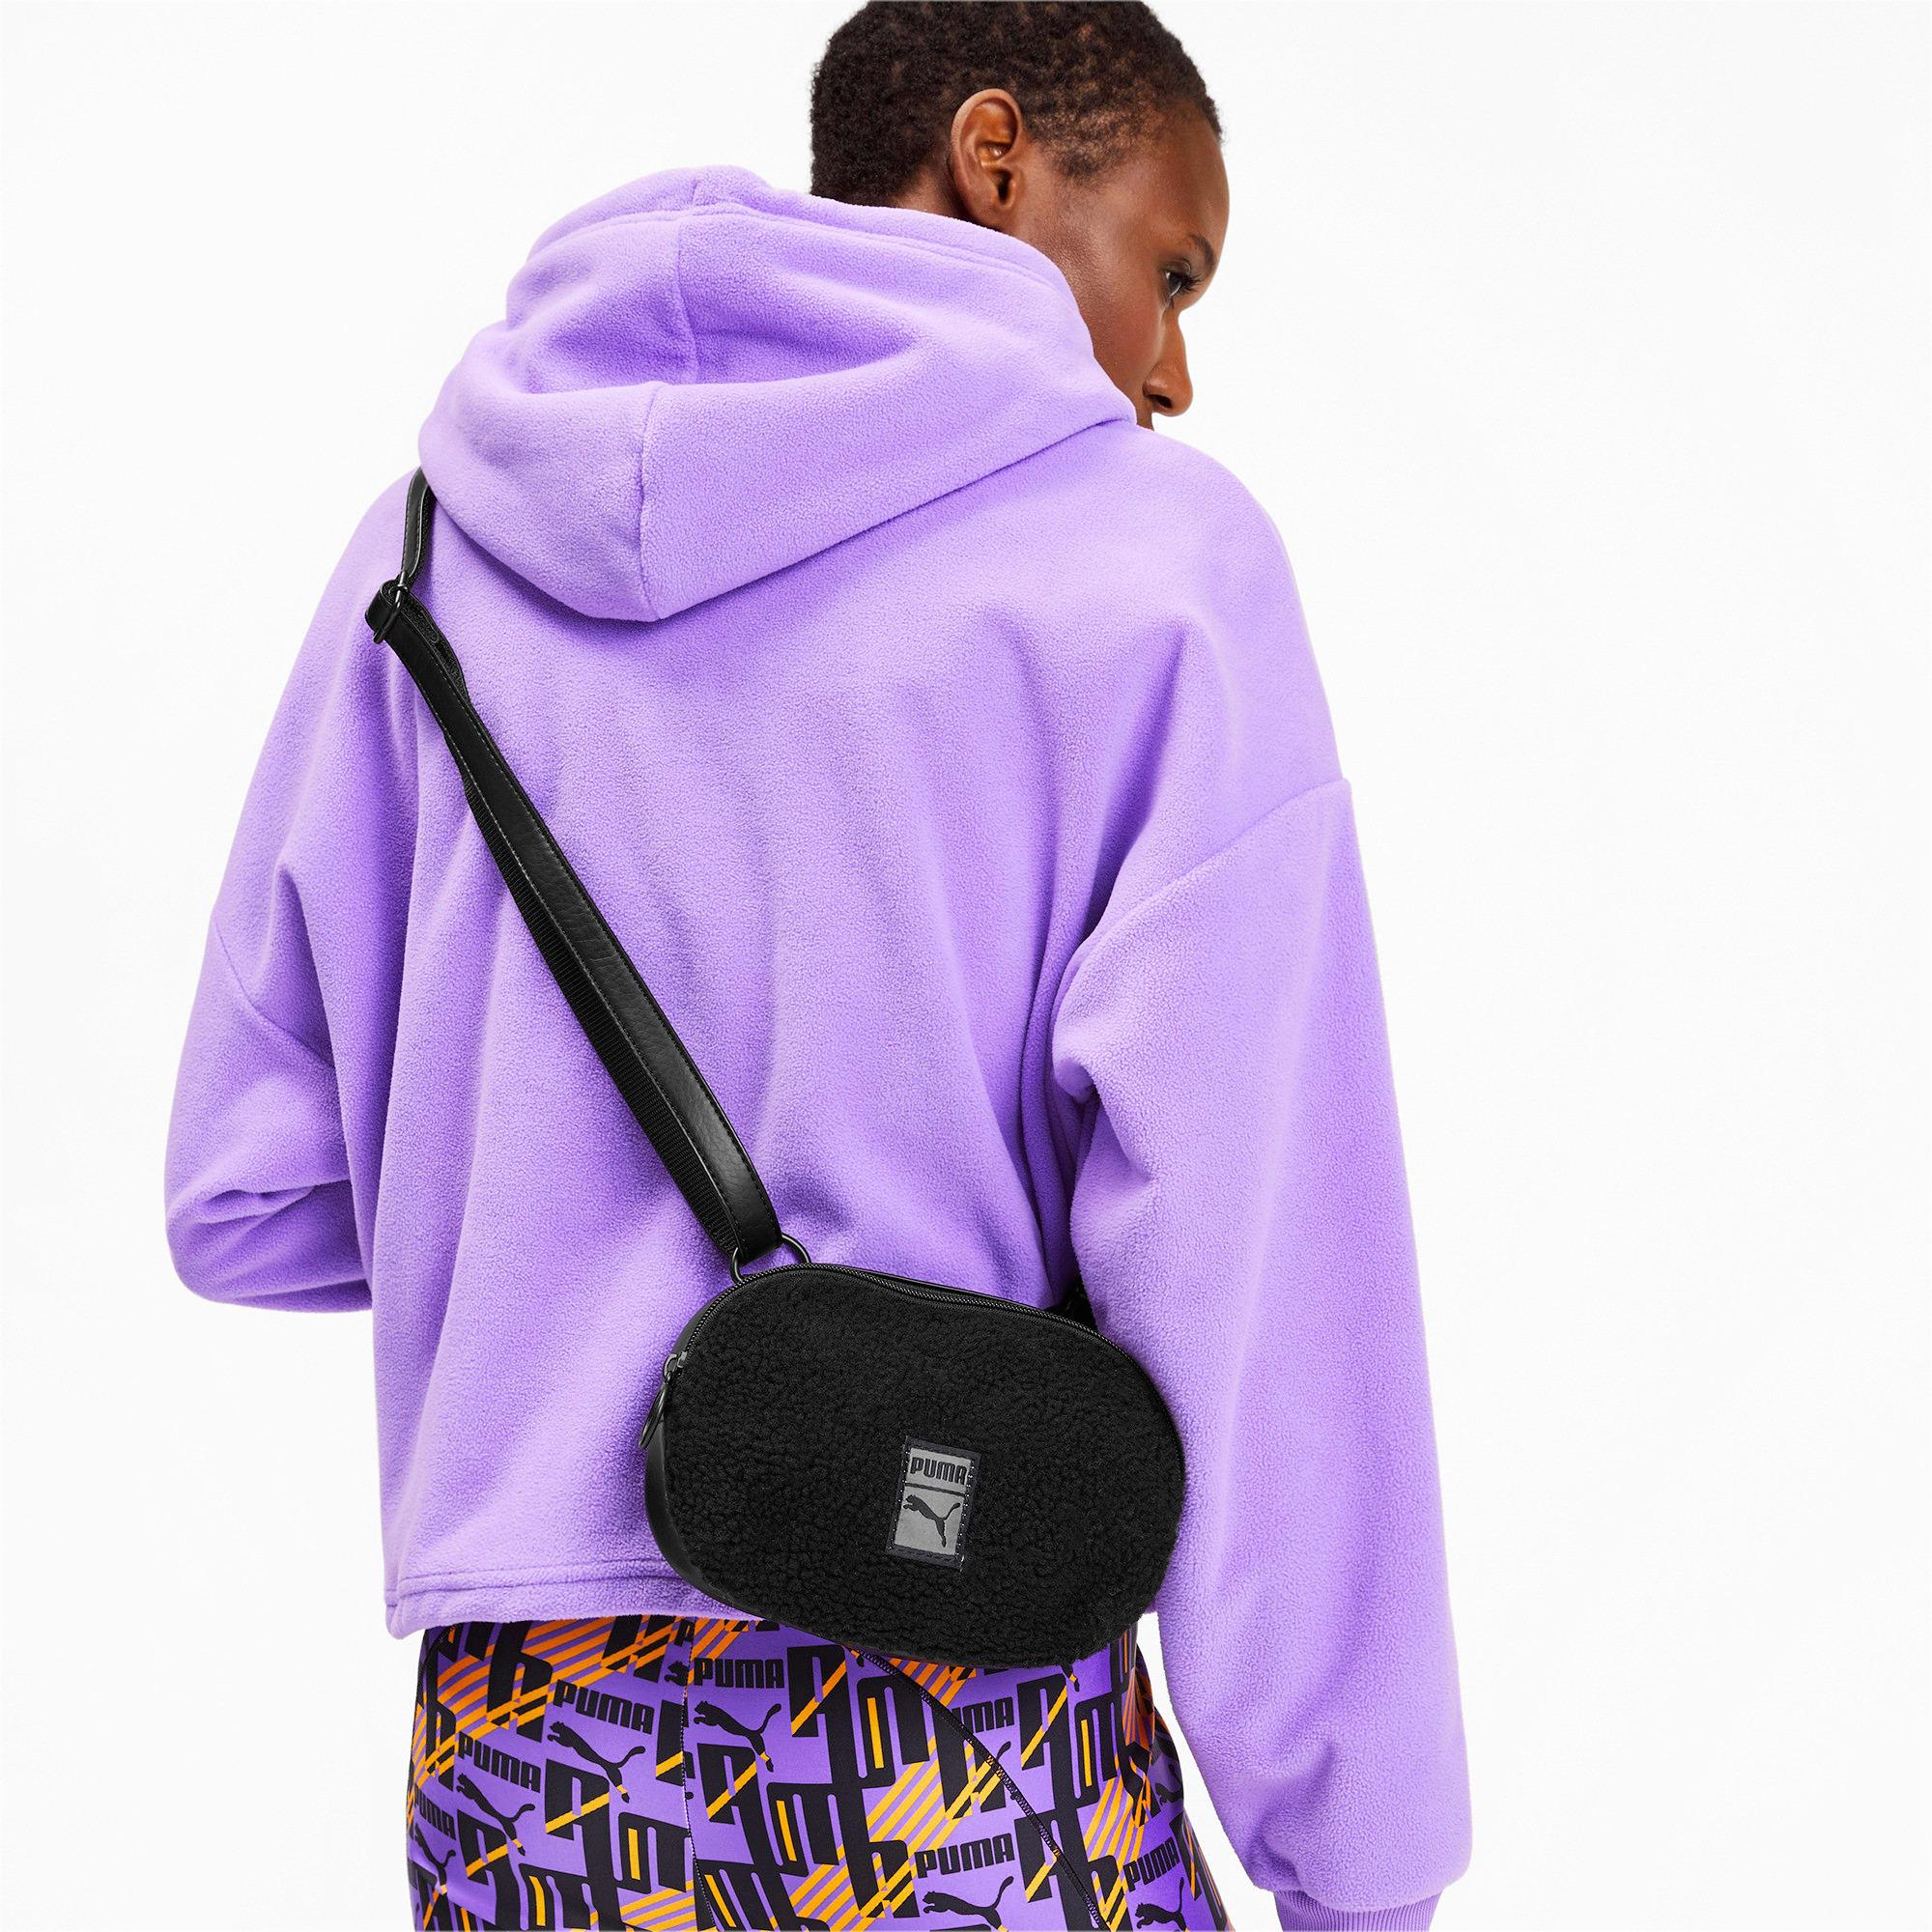 Thumbnail 2 of Prime Time Women's X-Body Bag, Puma Black-Puma Black, medium-IND